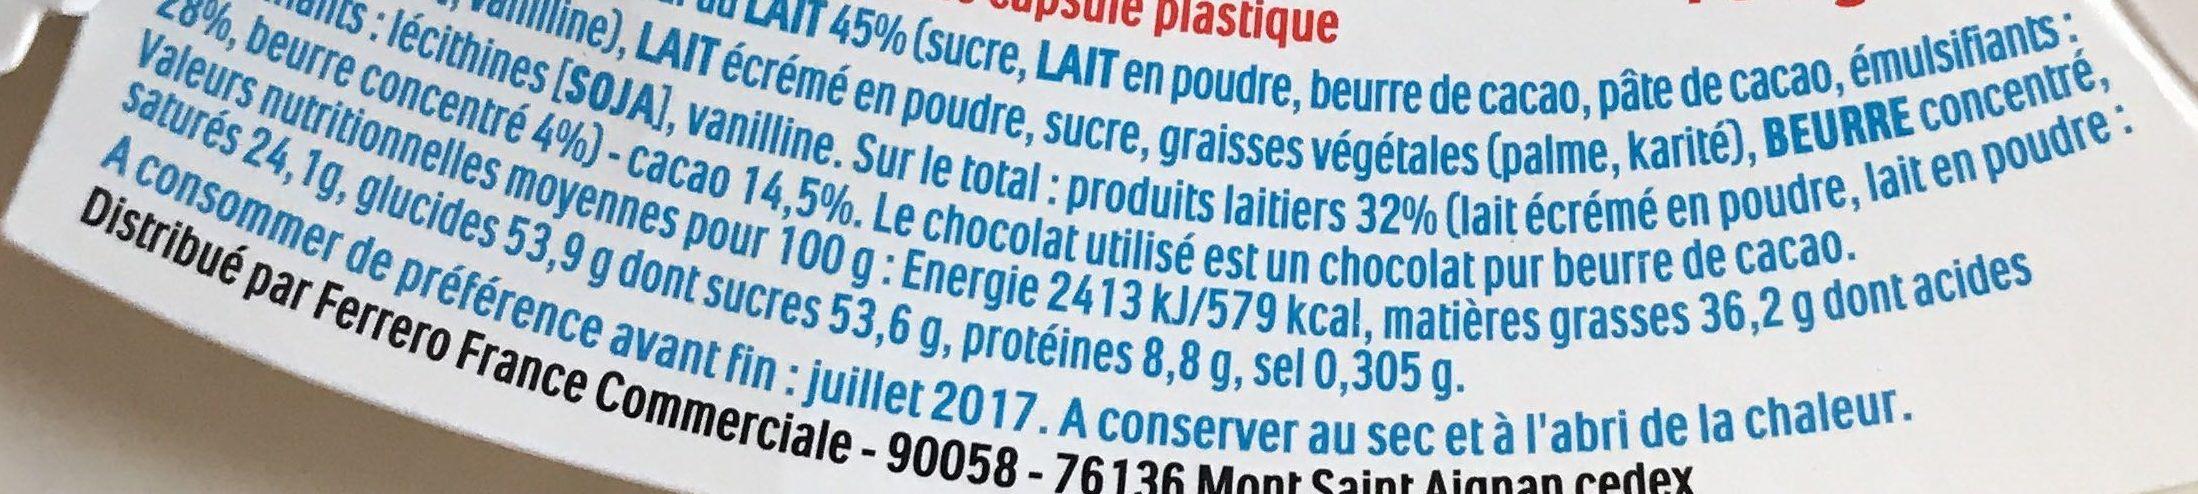 Pâques Maxi Kinder Surprise garçon œuf chocolat - Voedingswaarden - fr